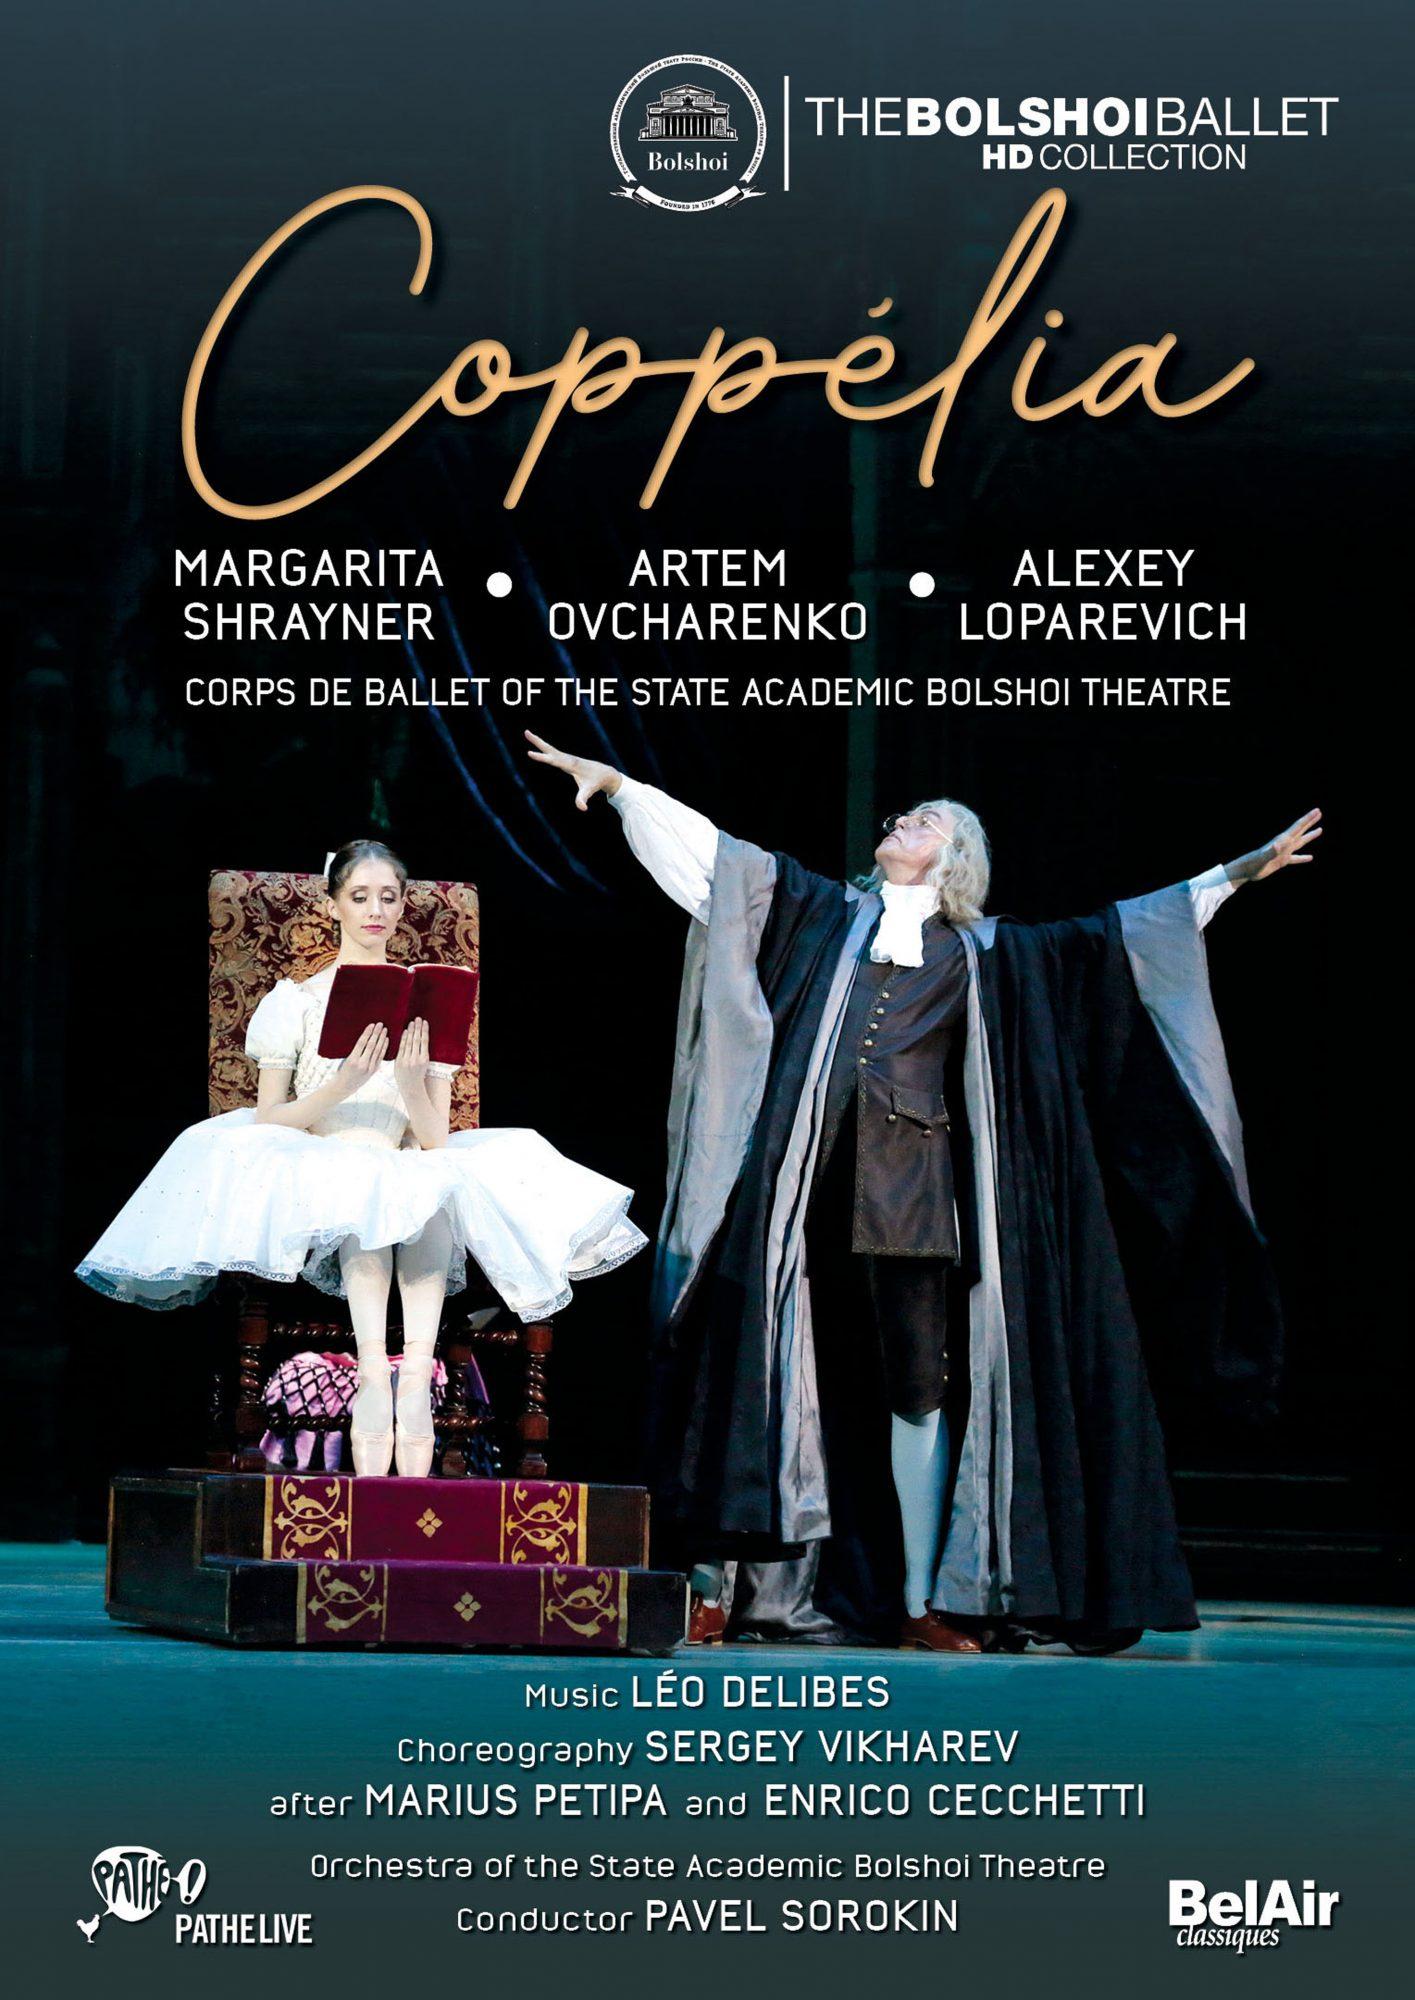 The Bolshoi Ballet HD Collection [DVD & Blu-ray] | BelAir Classiques